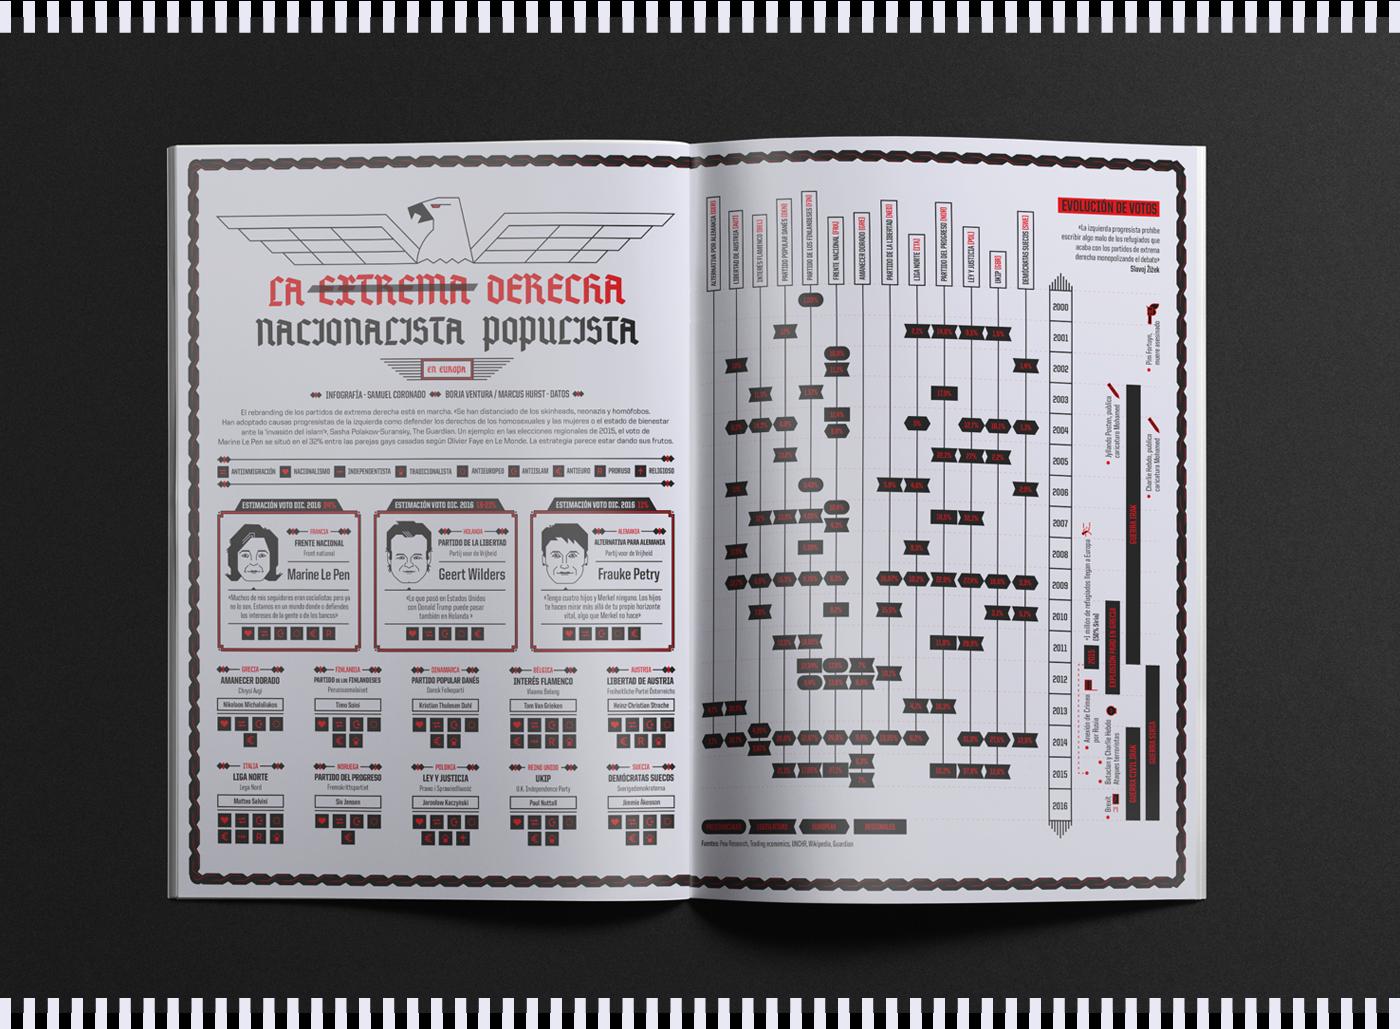 infografia infographics yorokobu politic derecha far right ultraderecha le pen geert wilders frauke petry